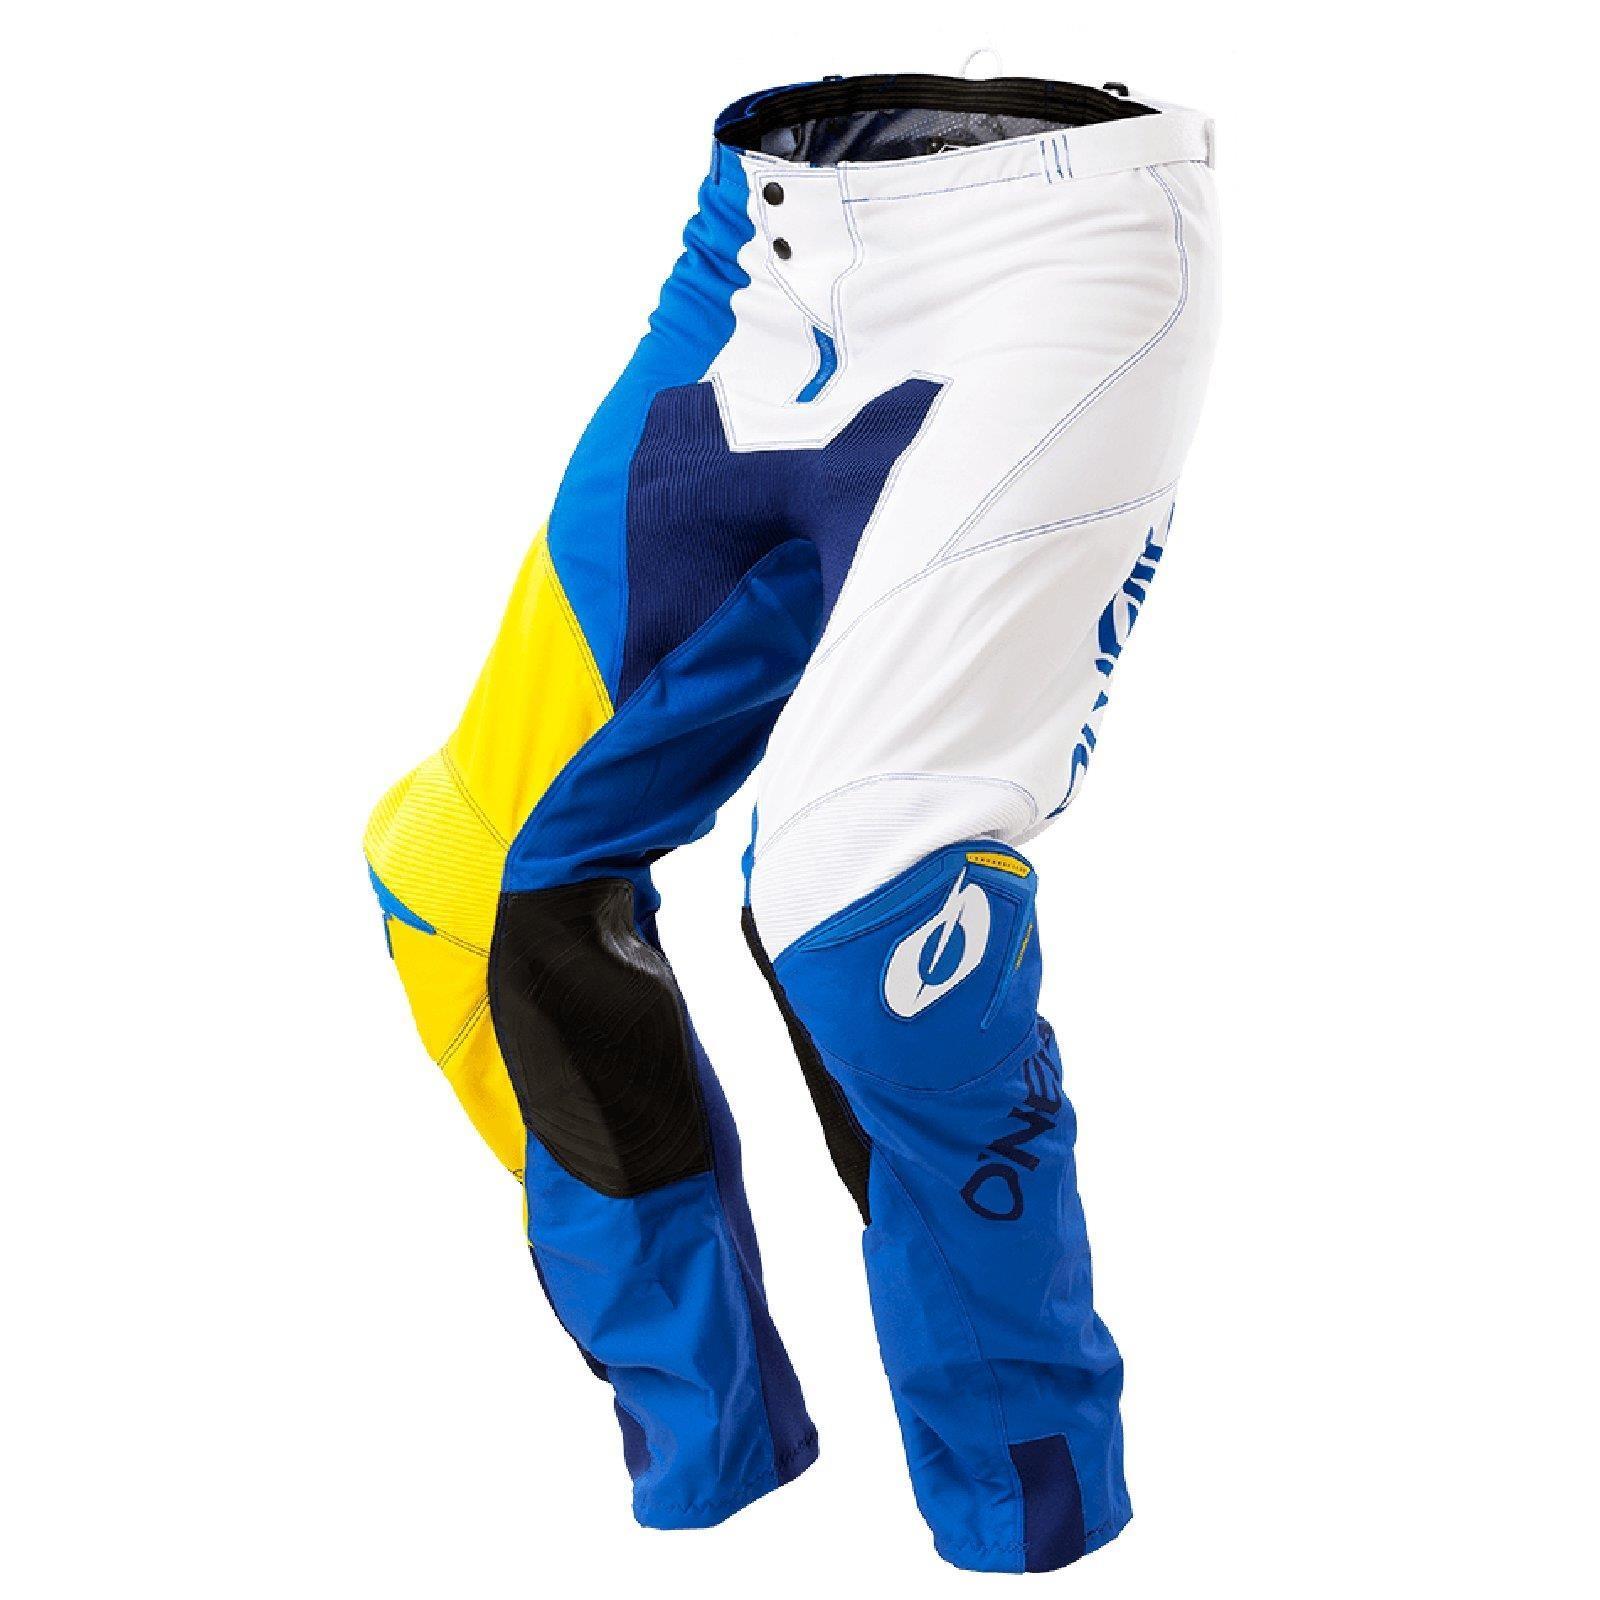 Bicicleta-de-montana-Enduro-MTB-downhill-pantalones-los-pantalones-oNeal-mayhem-que-Lite-split-Moto miniatura 6